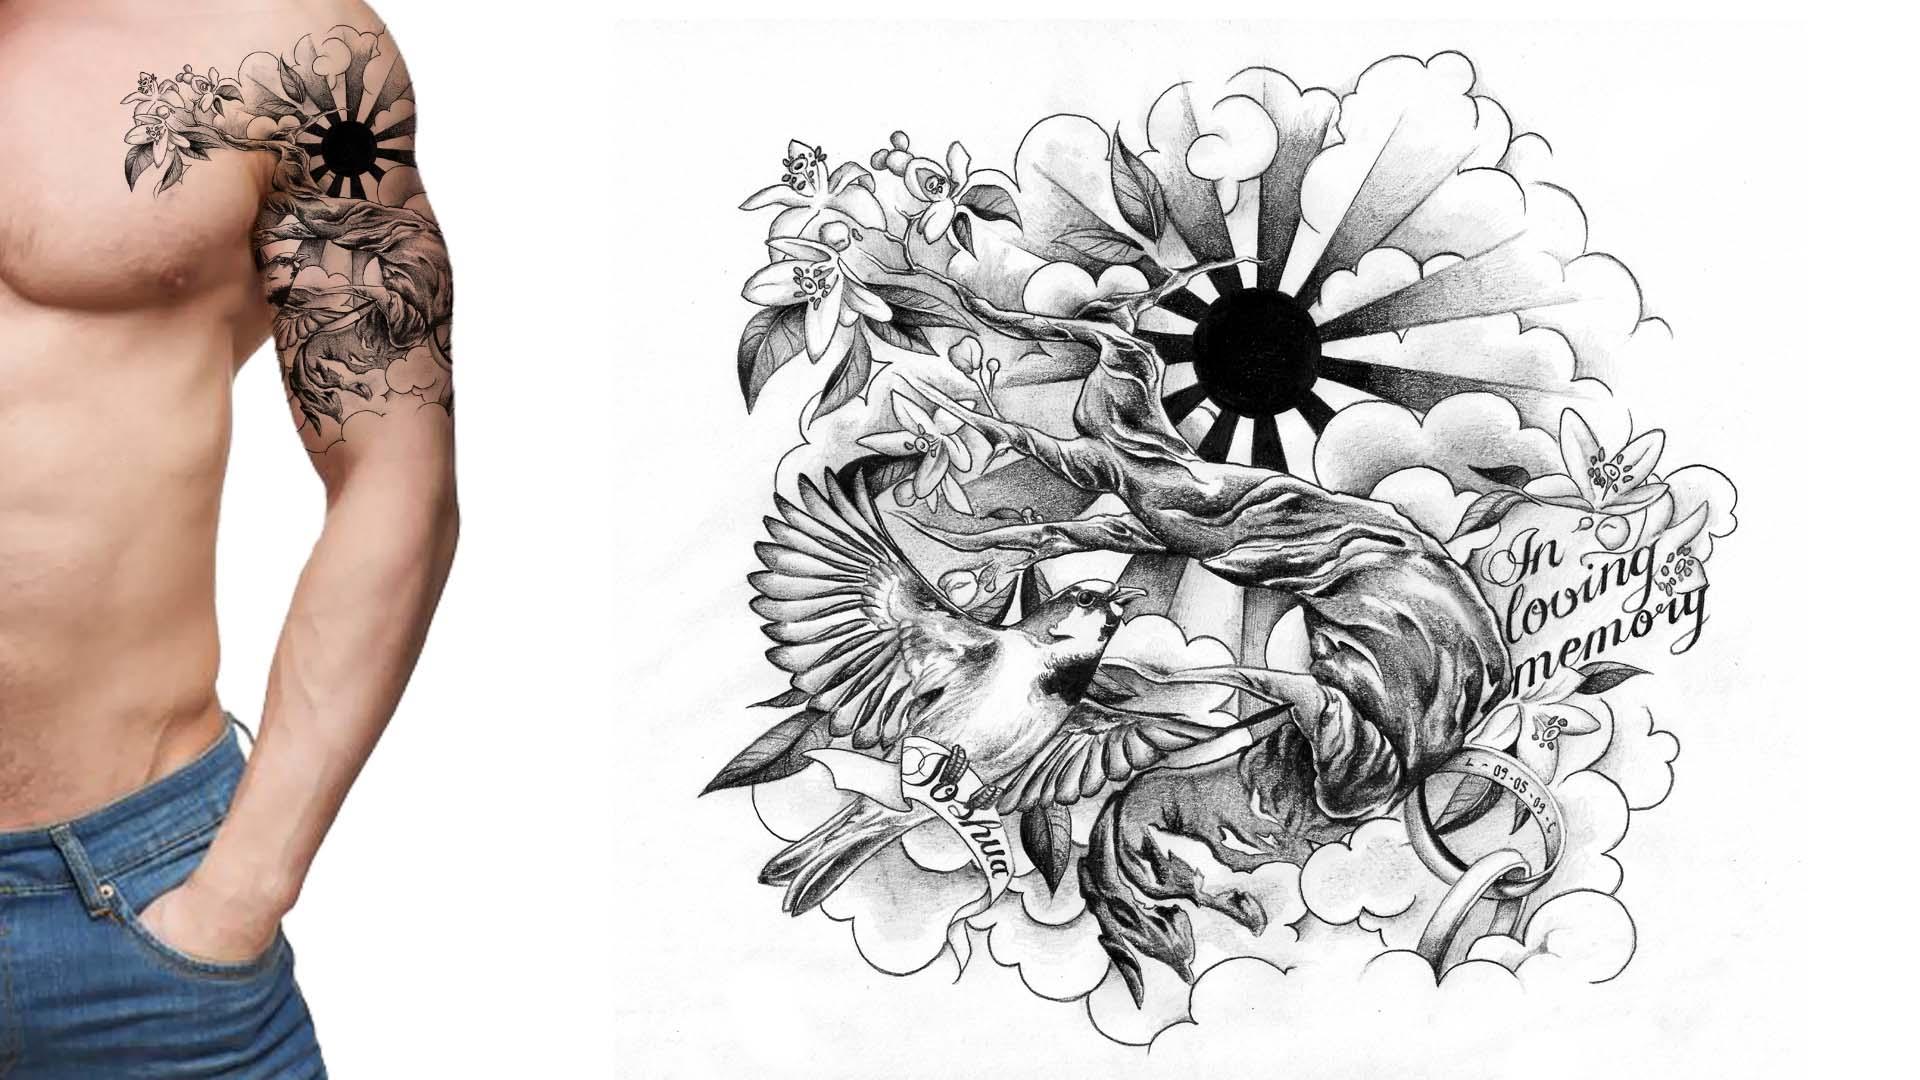 tattoo design artwork video gallery custom tattoo design. Black Bedroom Furniture Sets. Home Design Ideas